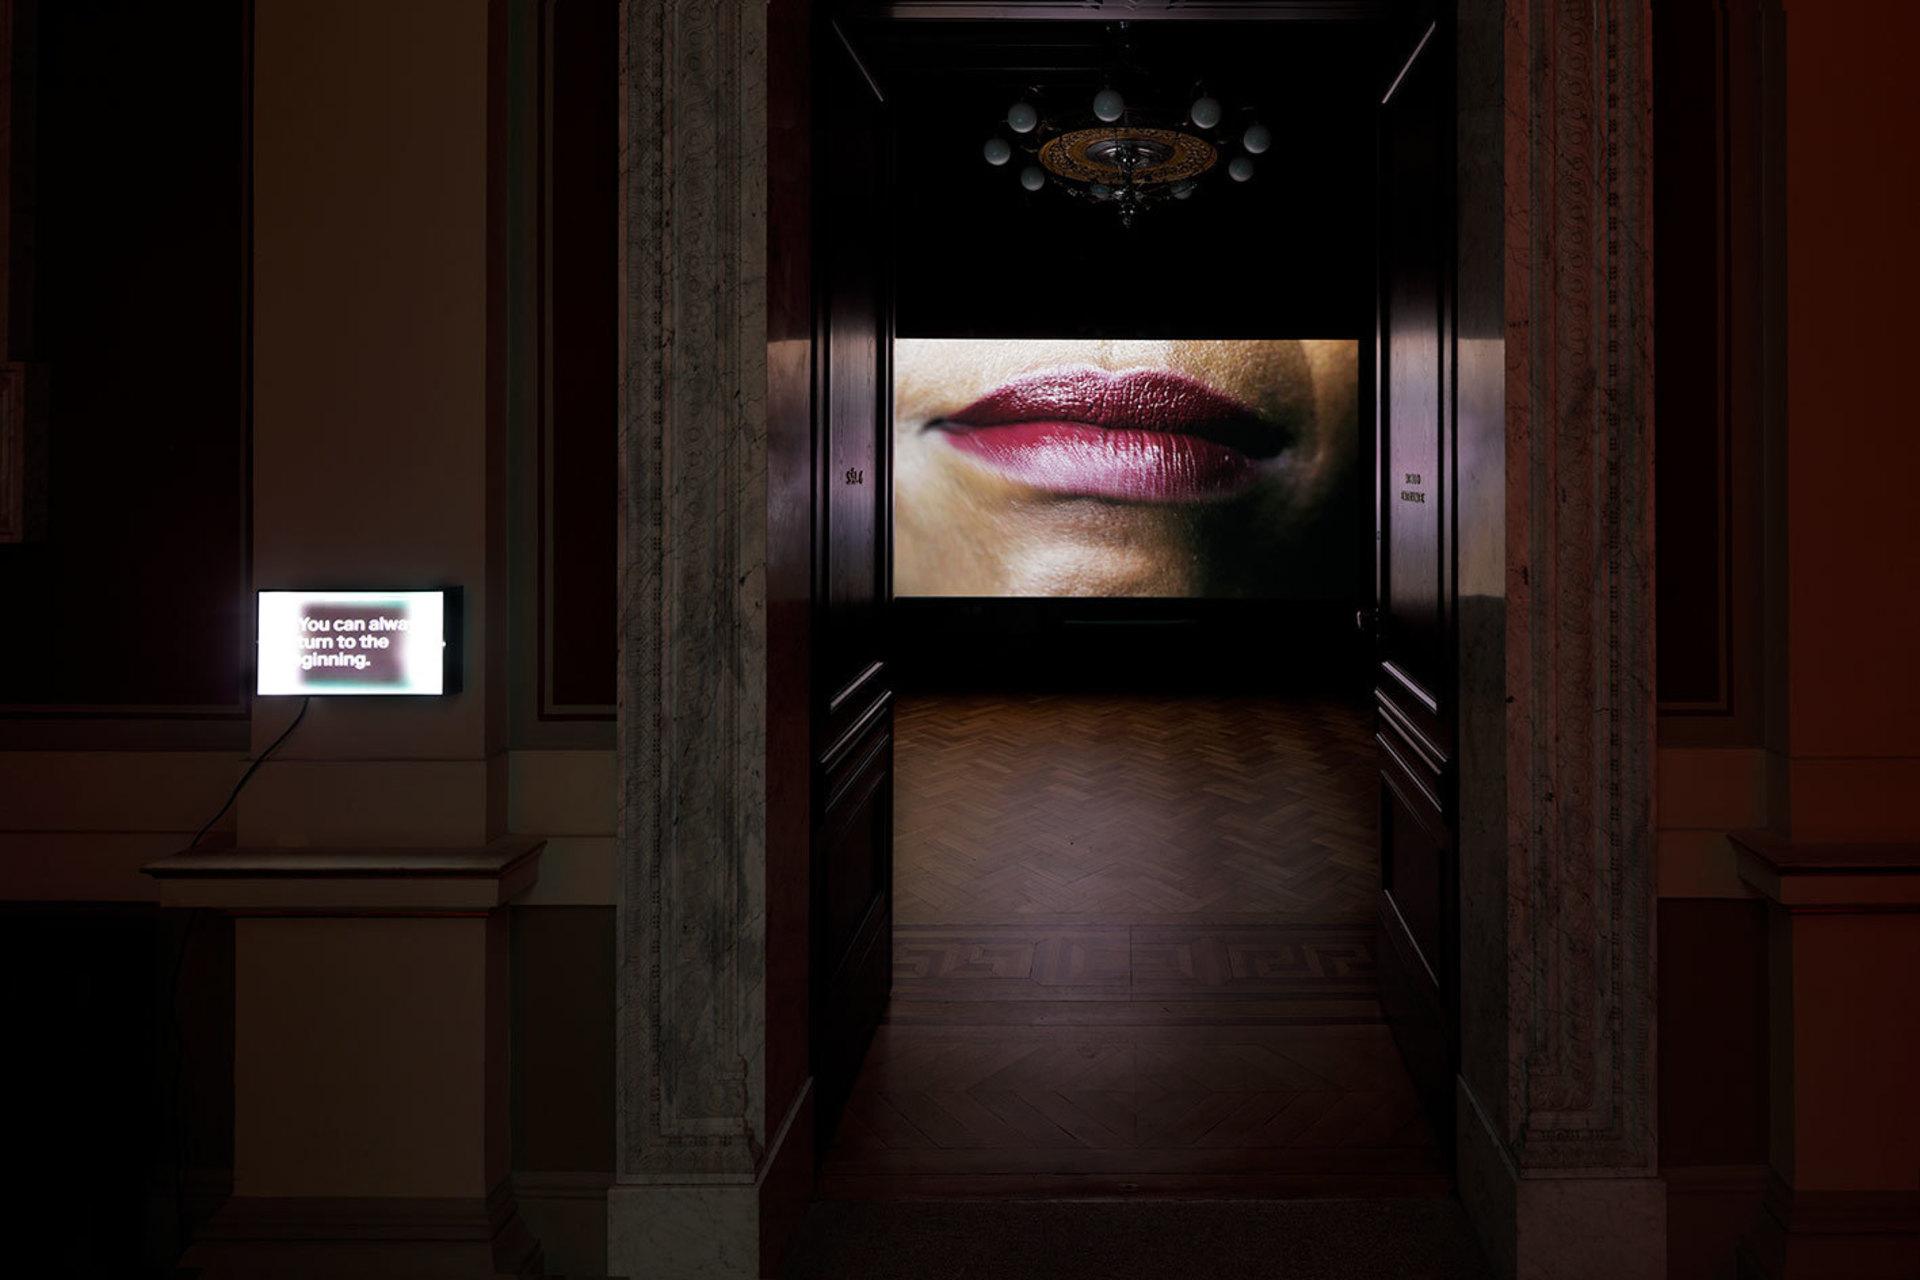 1CompassionFatigueIsOverCandice-Breitz_Sweat_2018_installation-view_-c_GalerieRudolfinum_Photo-Martin-Polak.jpg